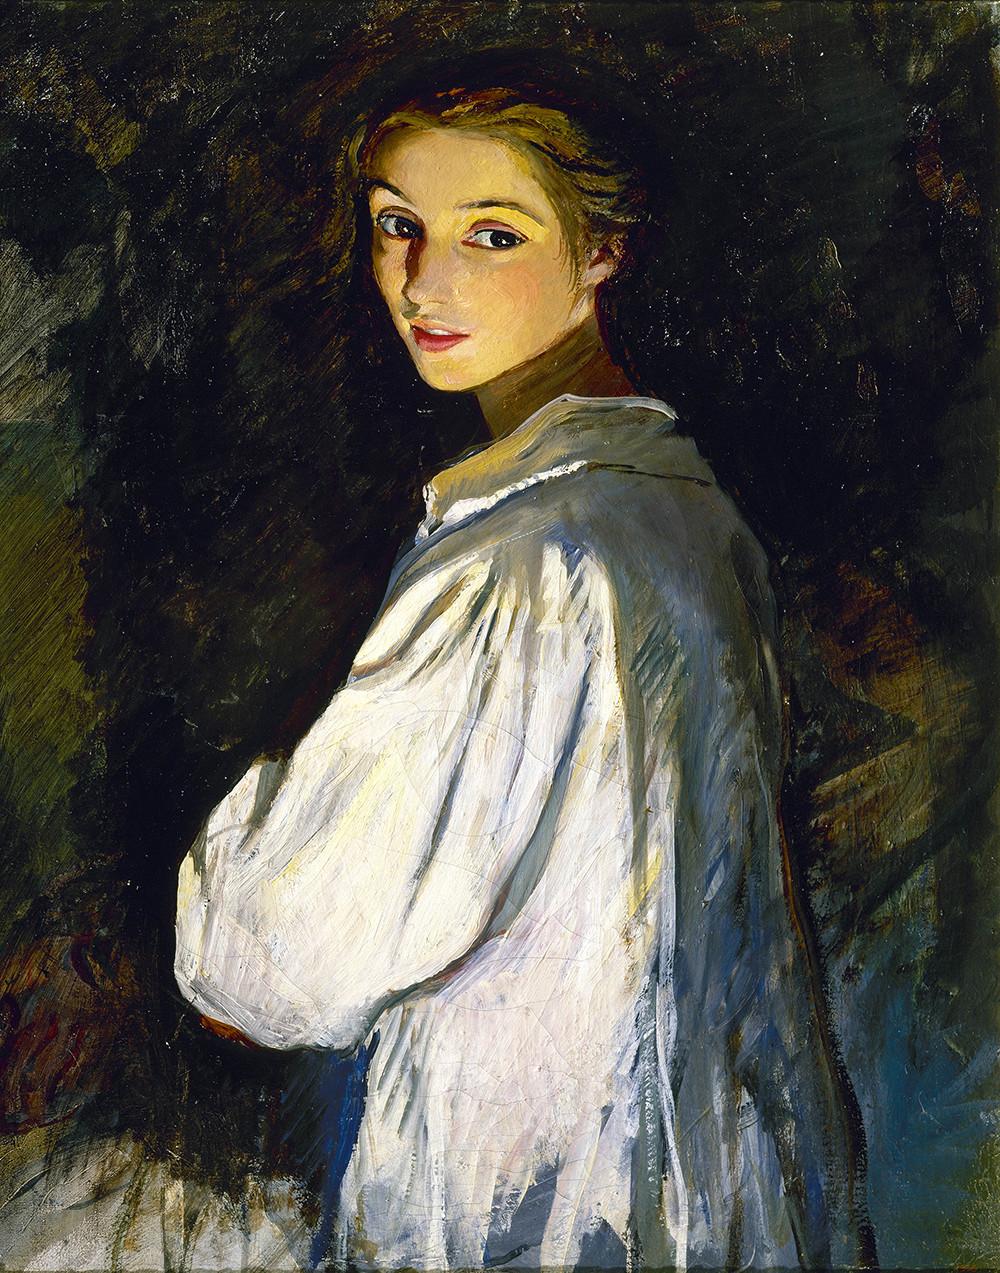 Zinaida Serebrjakova / Autoritratto, 1911